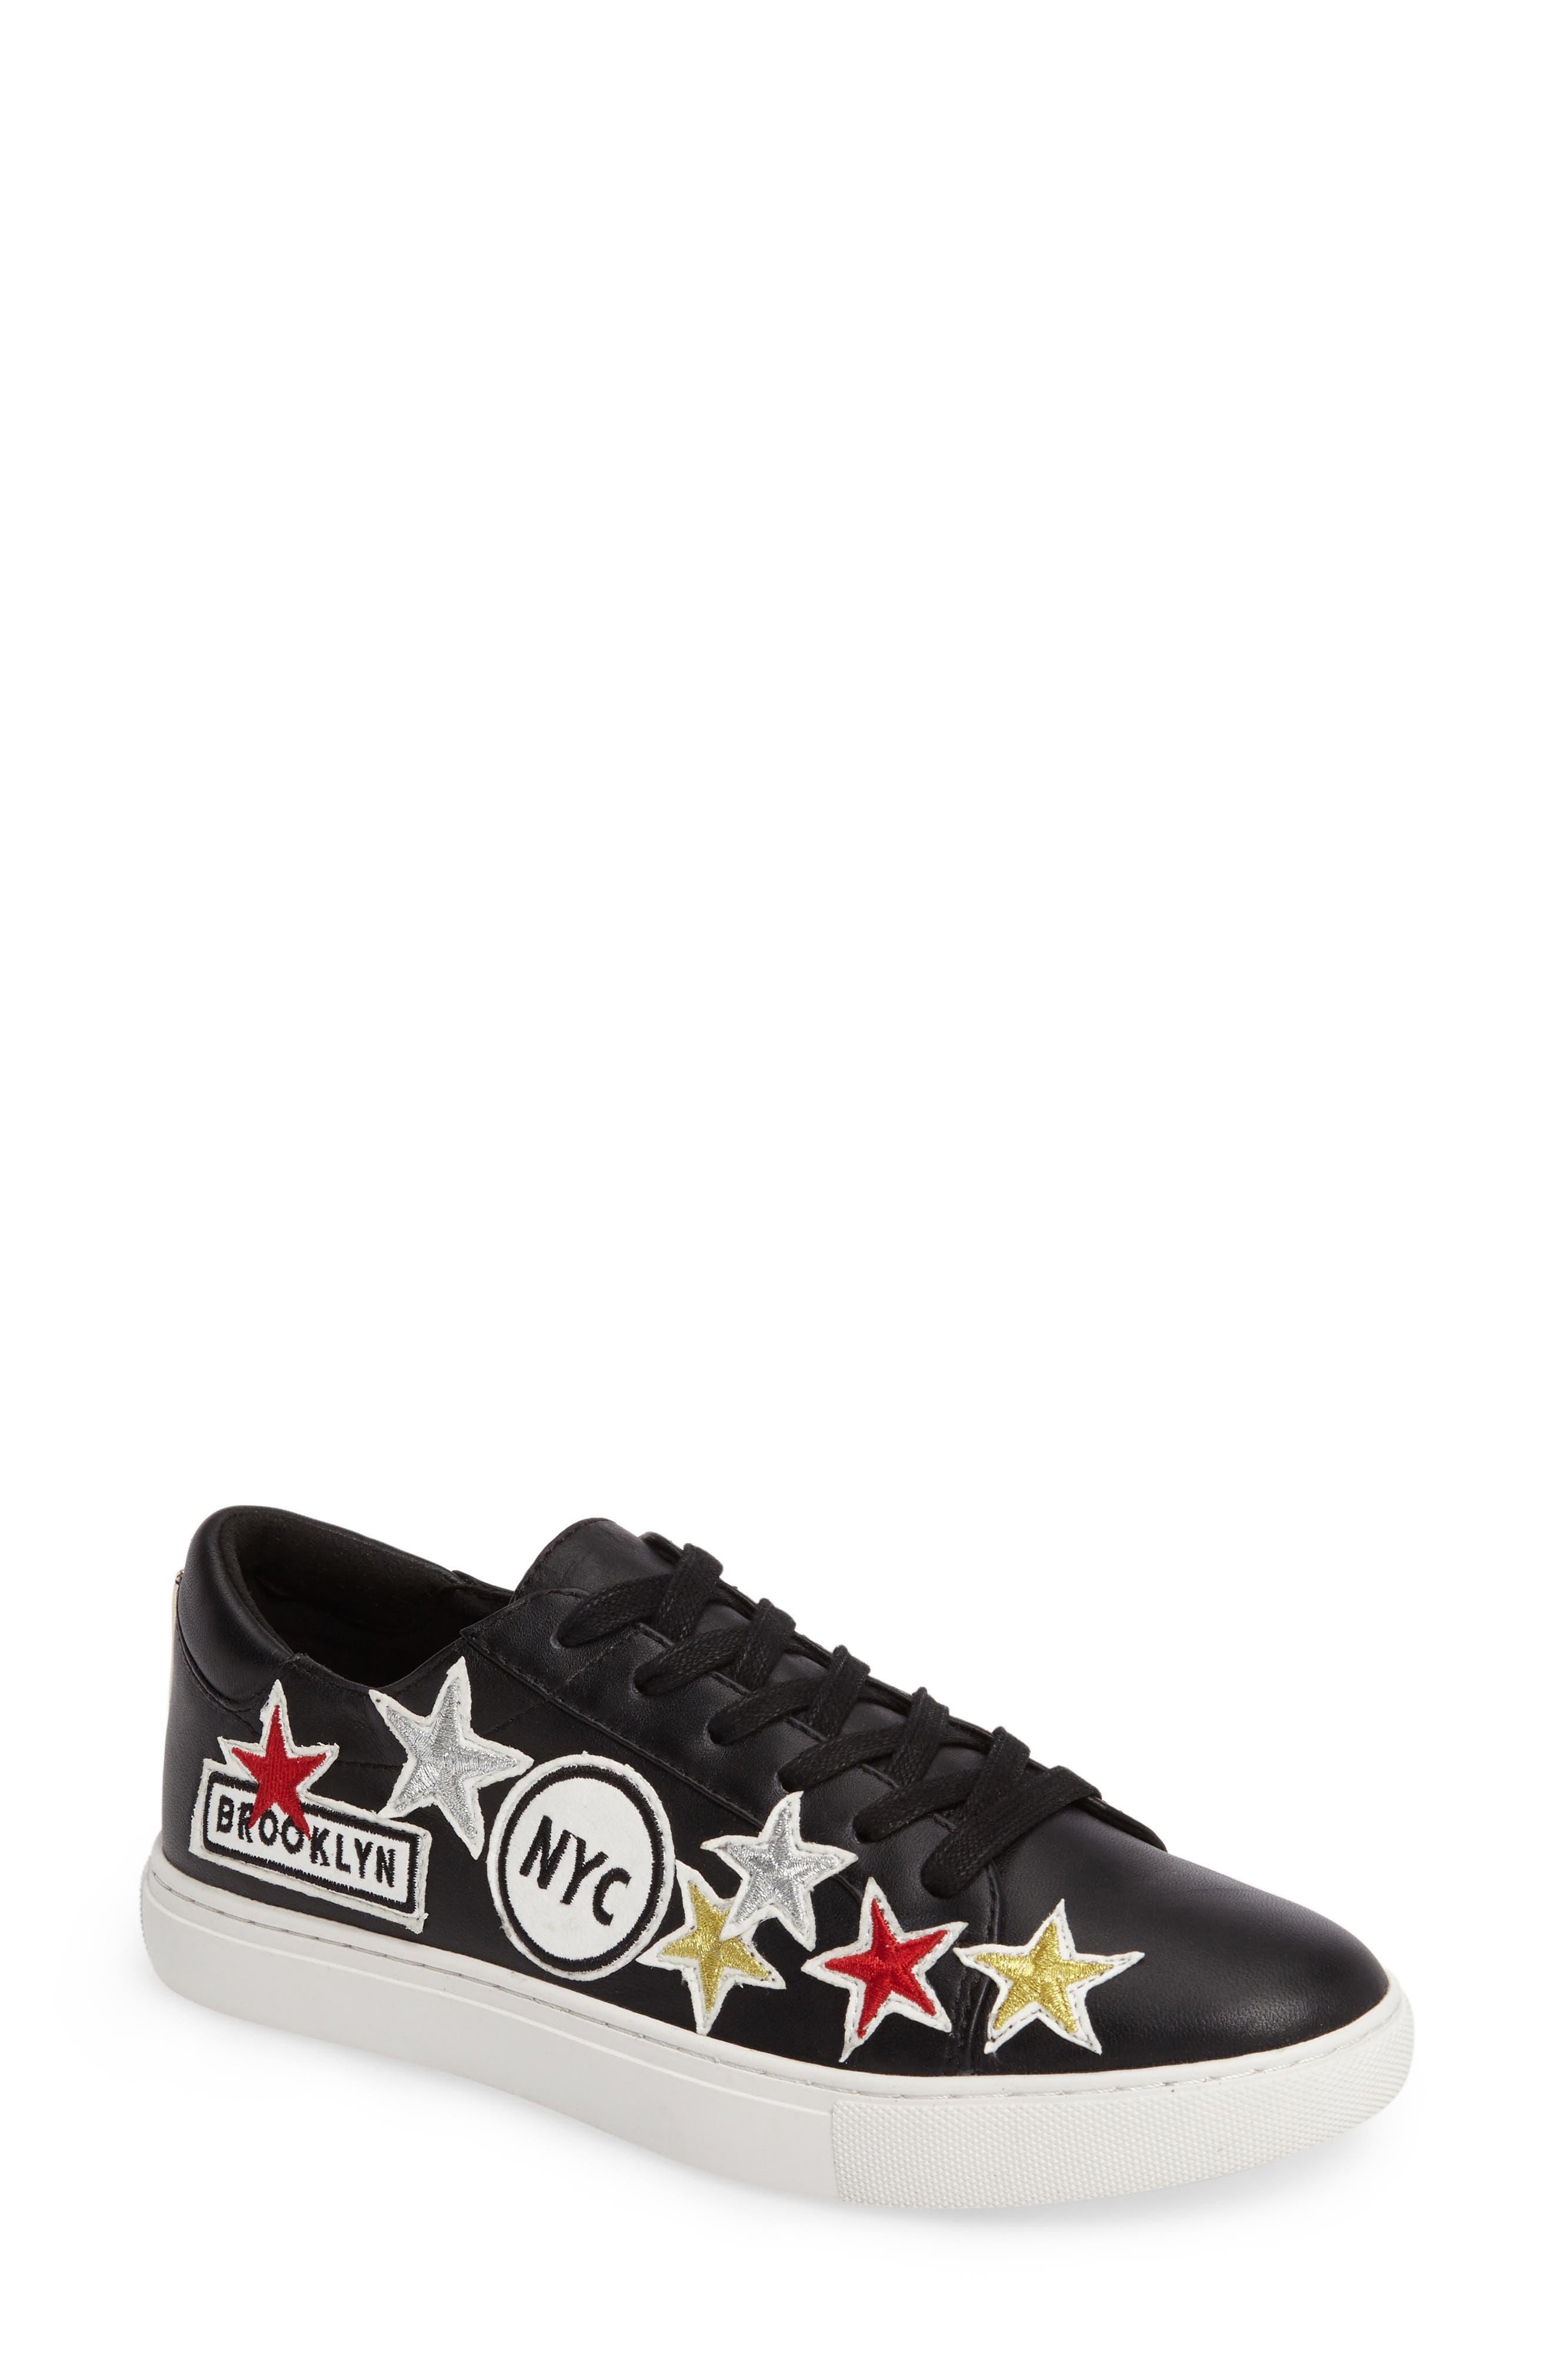 Kam NYC Sneaker,                             Main thumbnail 1, color,